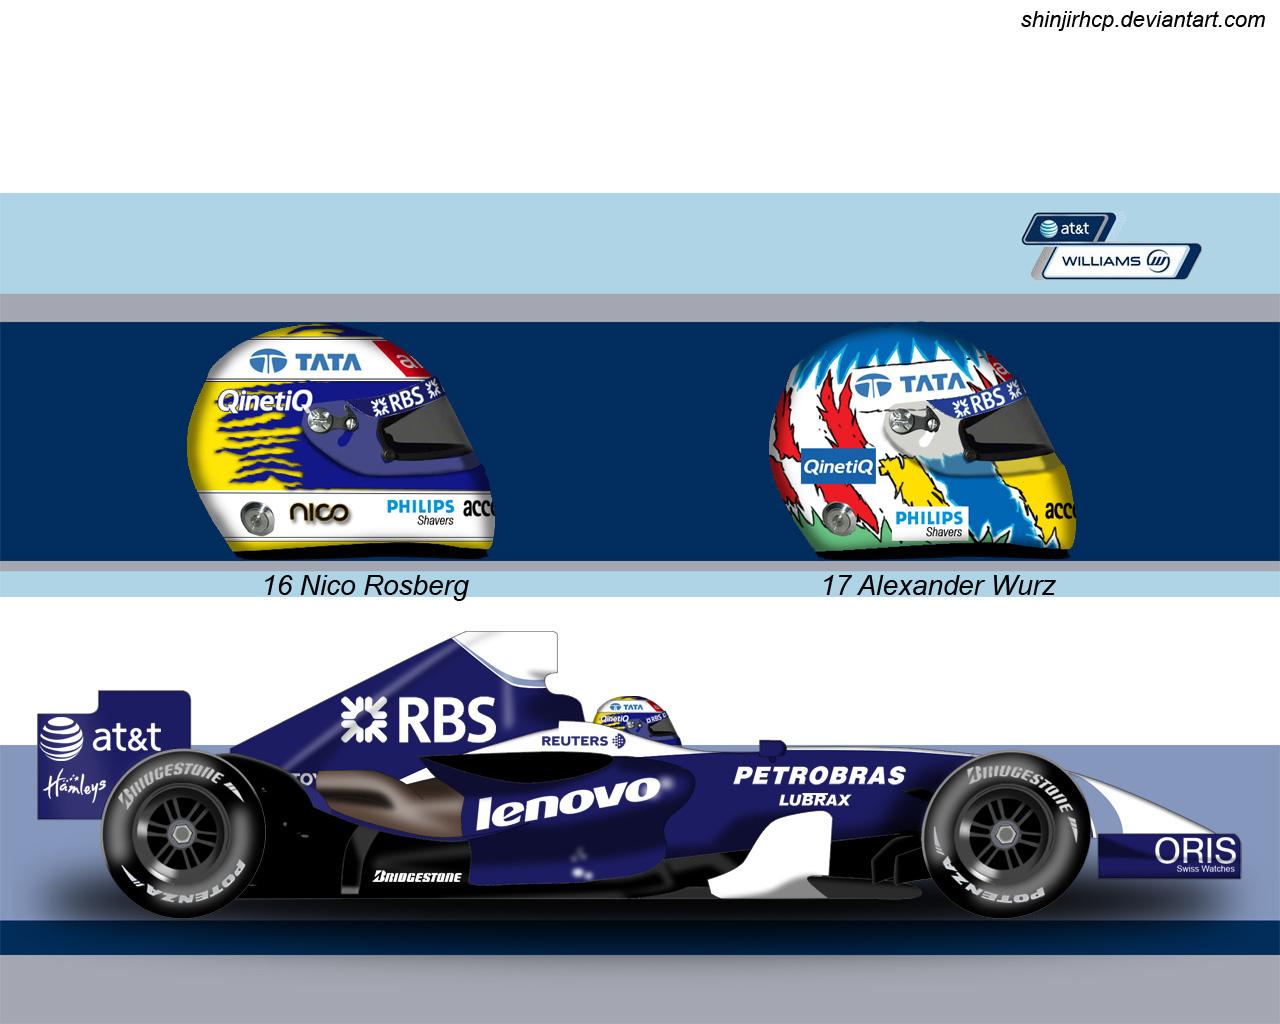 Williams FW29 by ShinjiRHCP